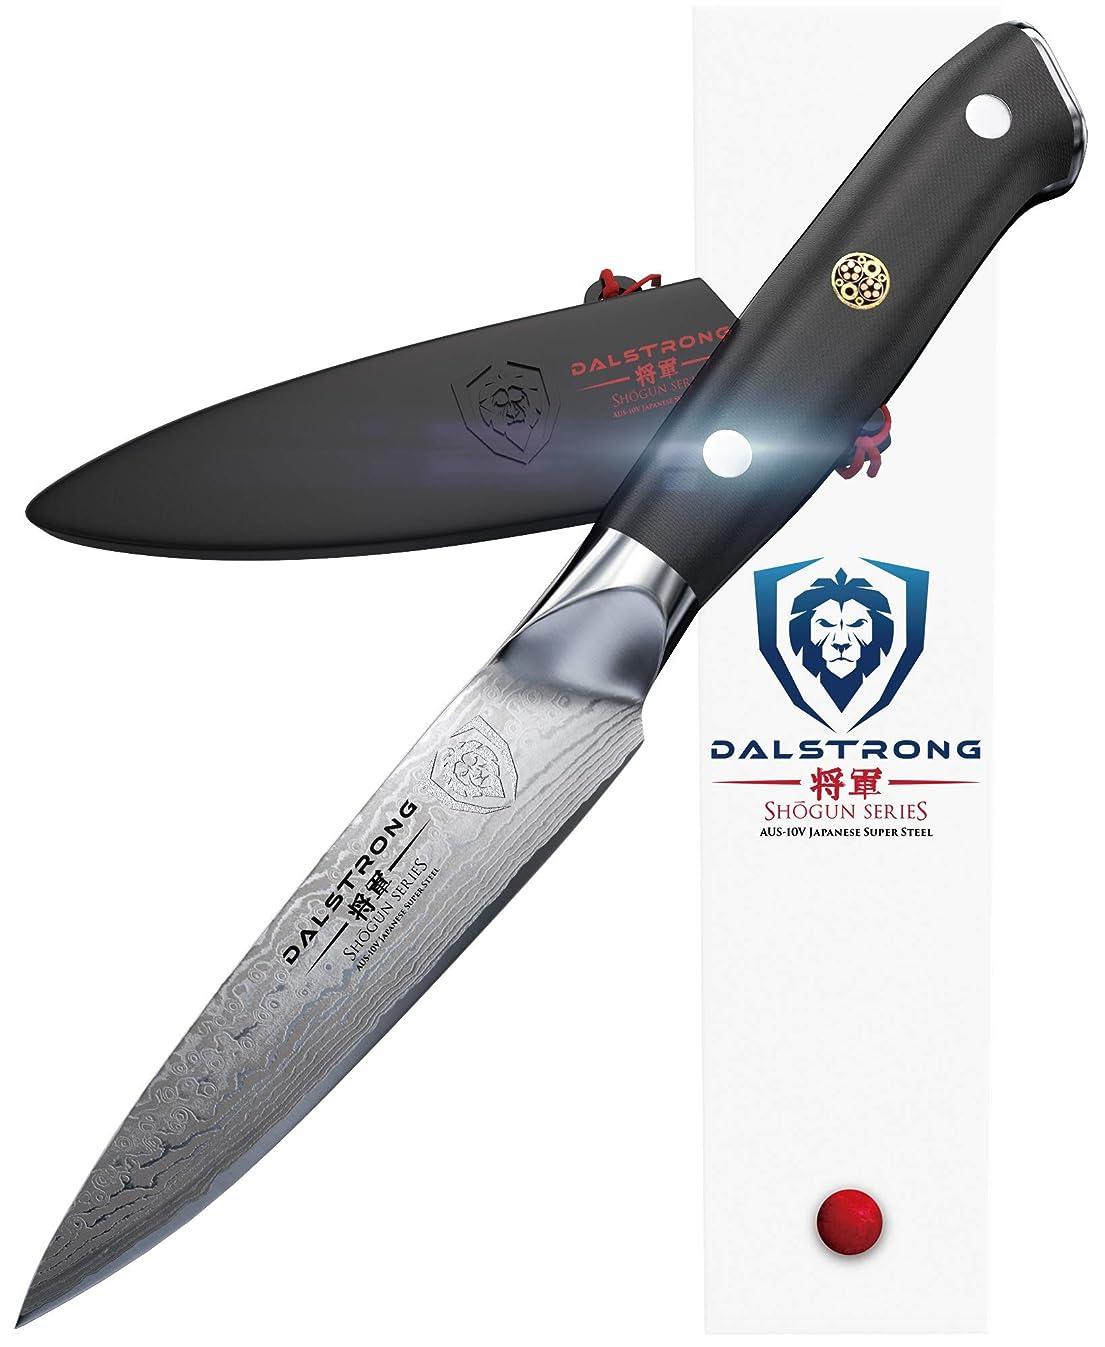 DALSTRONG Paring Knife - Shogun Series - Damascus - AUS-10V- Vacuum Treated - 3.5